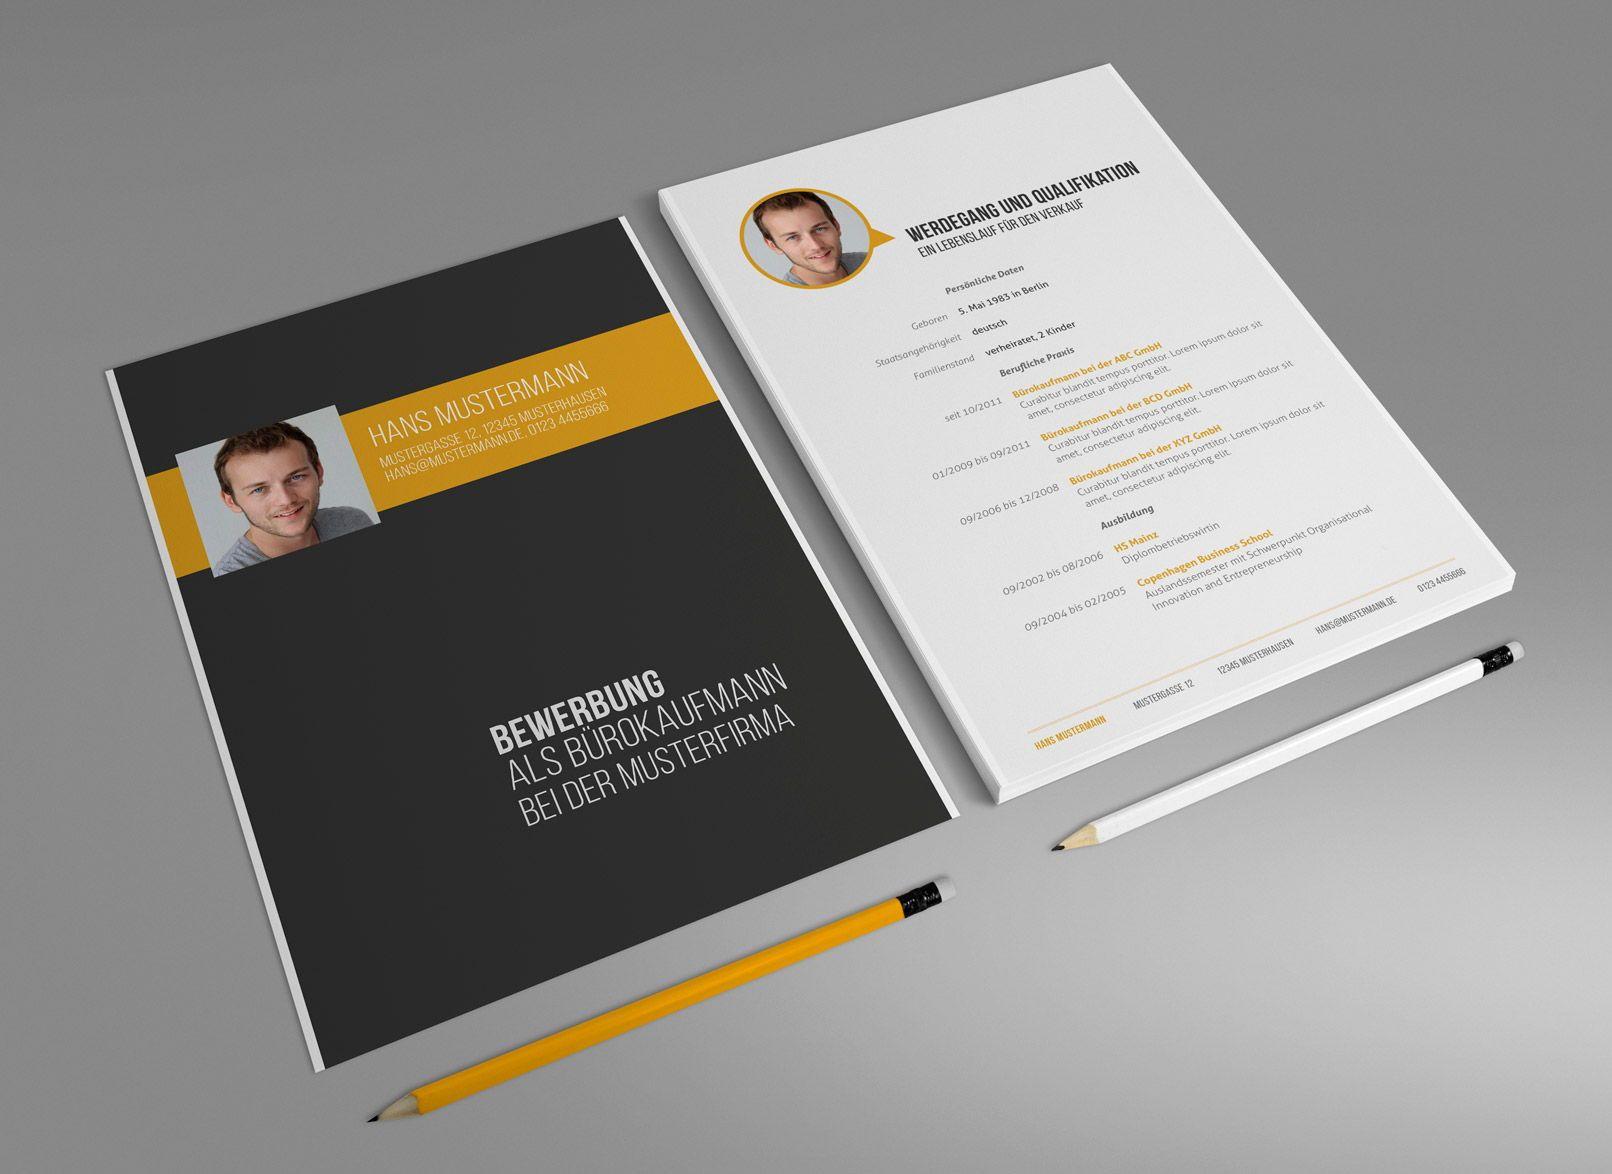 Bewerbung Als Burokauffrau Burokaufmann Design Muster Download Bewerbung Als Burokauffrau Bewerbung Lebenslauf Kauffrau